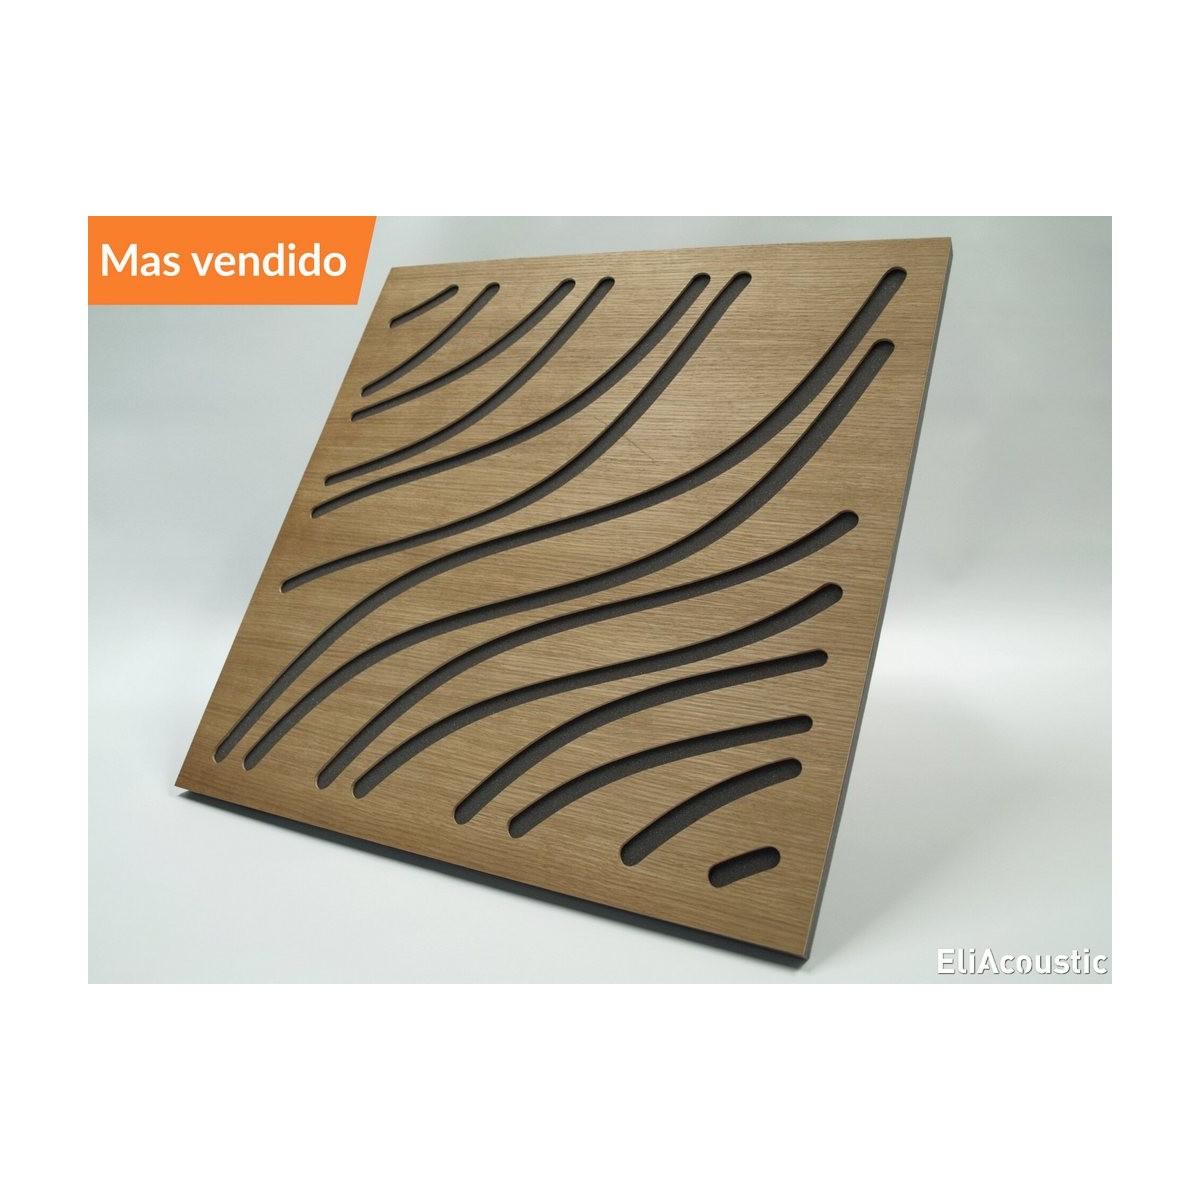 EliAcoustic Marine Luxury White. Panel Acustico de madera para instalar en paredes, techo, esquina o falso techo.